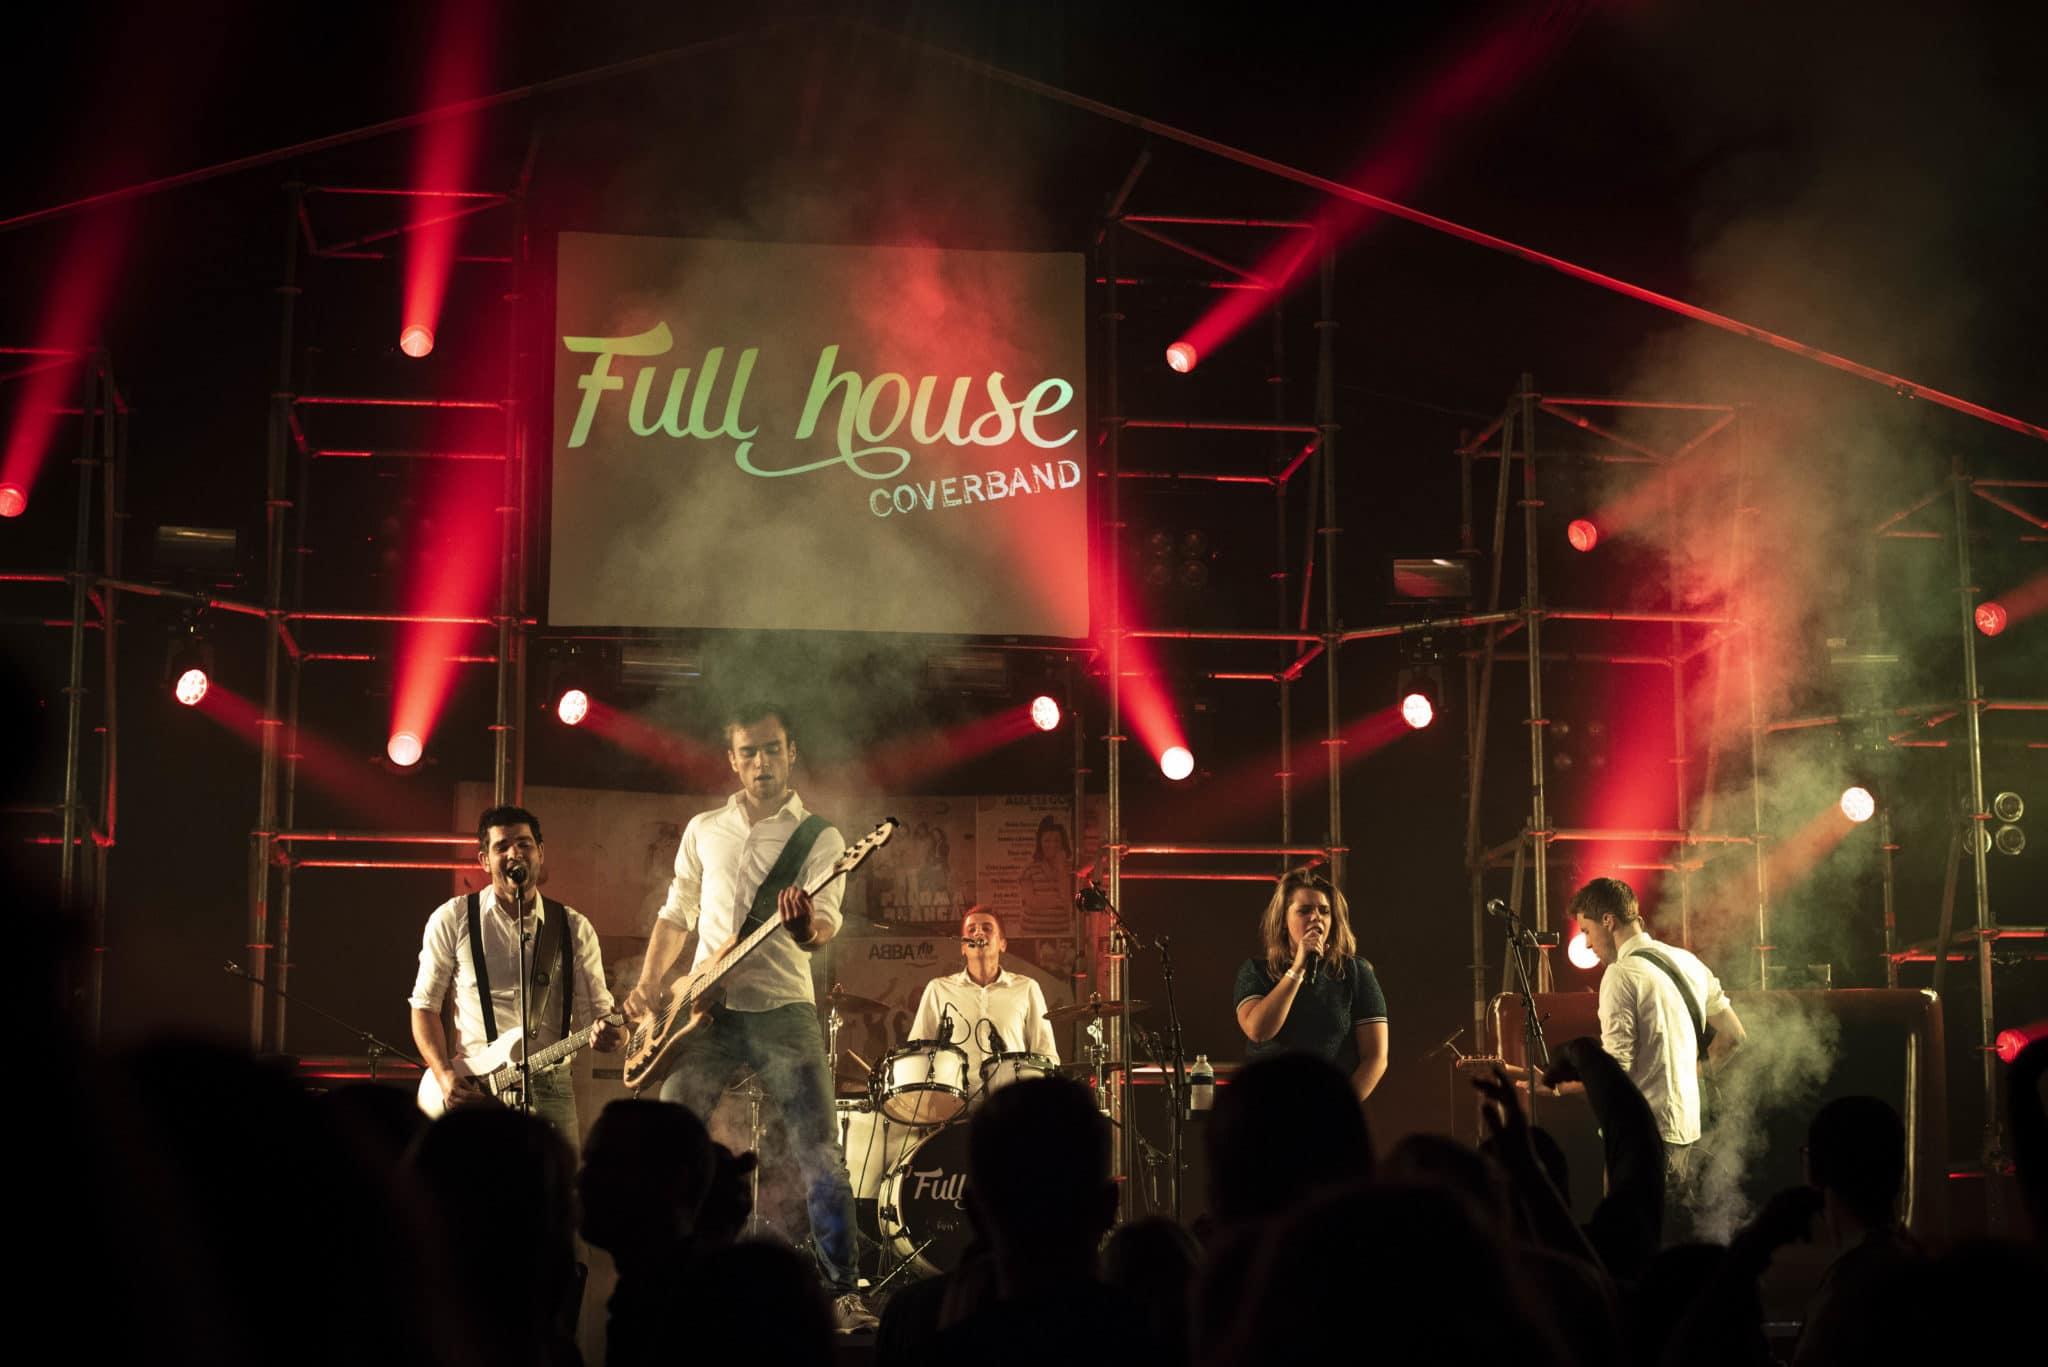 Full House concertfotografie Pieperfestival Emmeloord